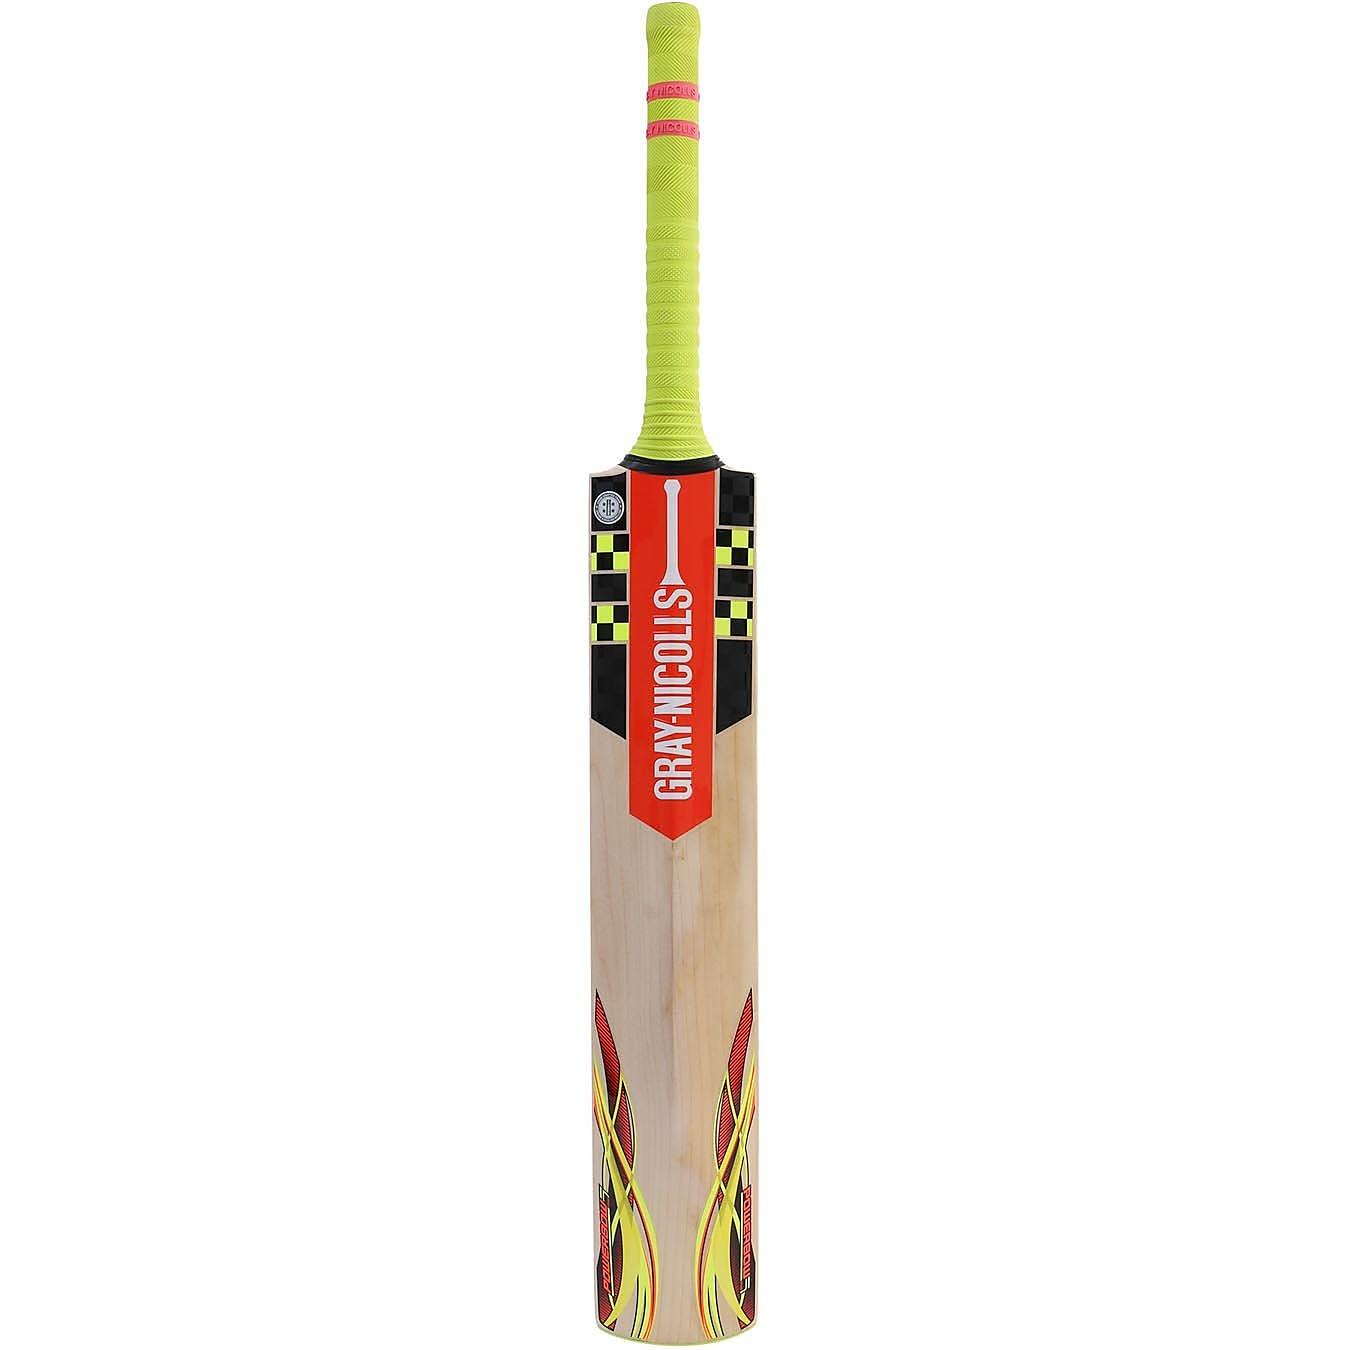 Gray Nicolls POWERBOW 5 STAR Cricket Bat